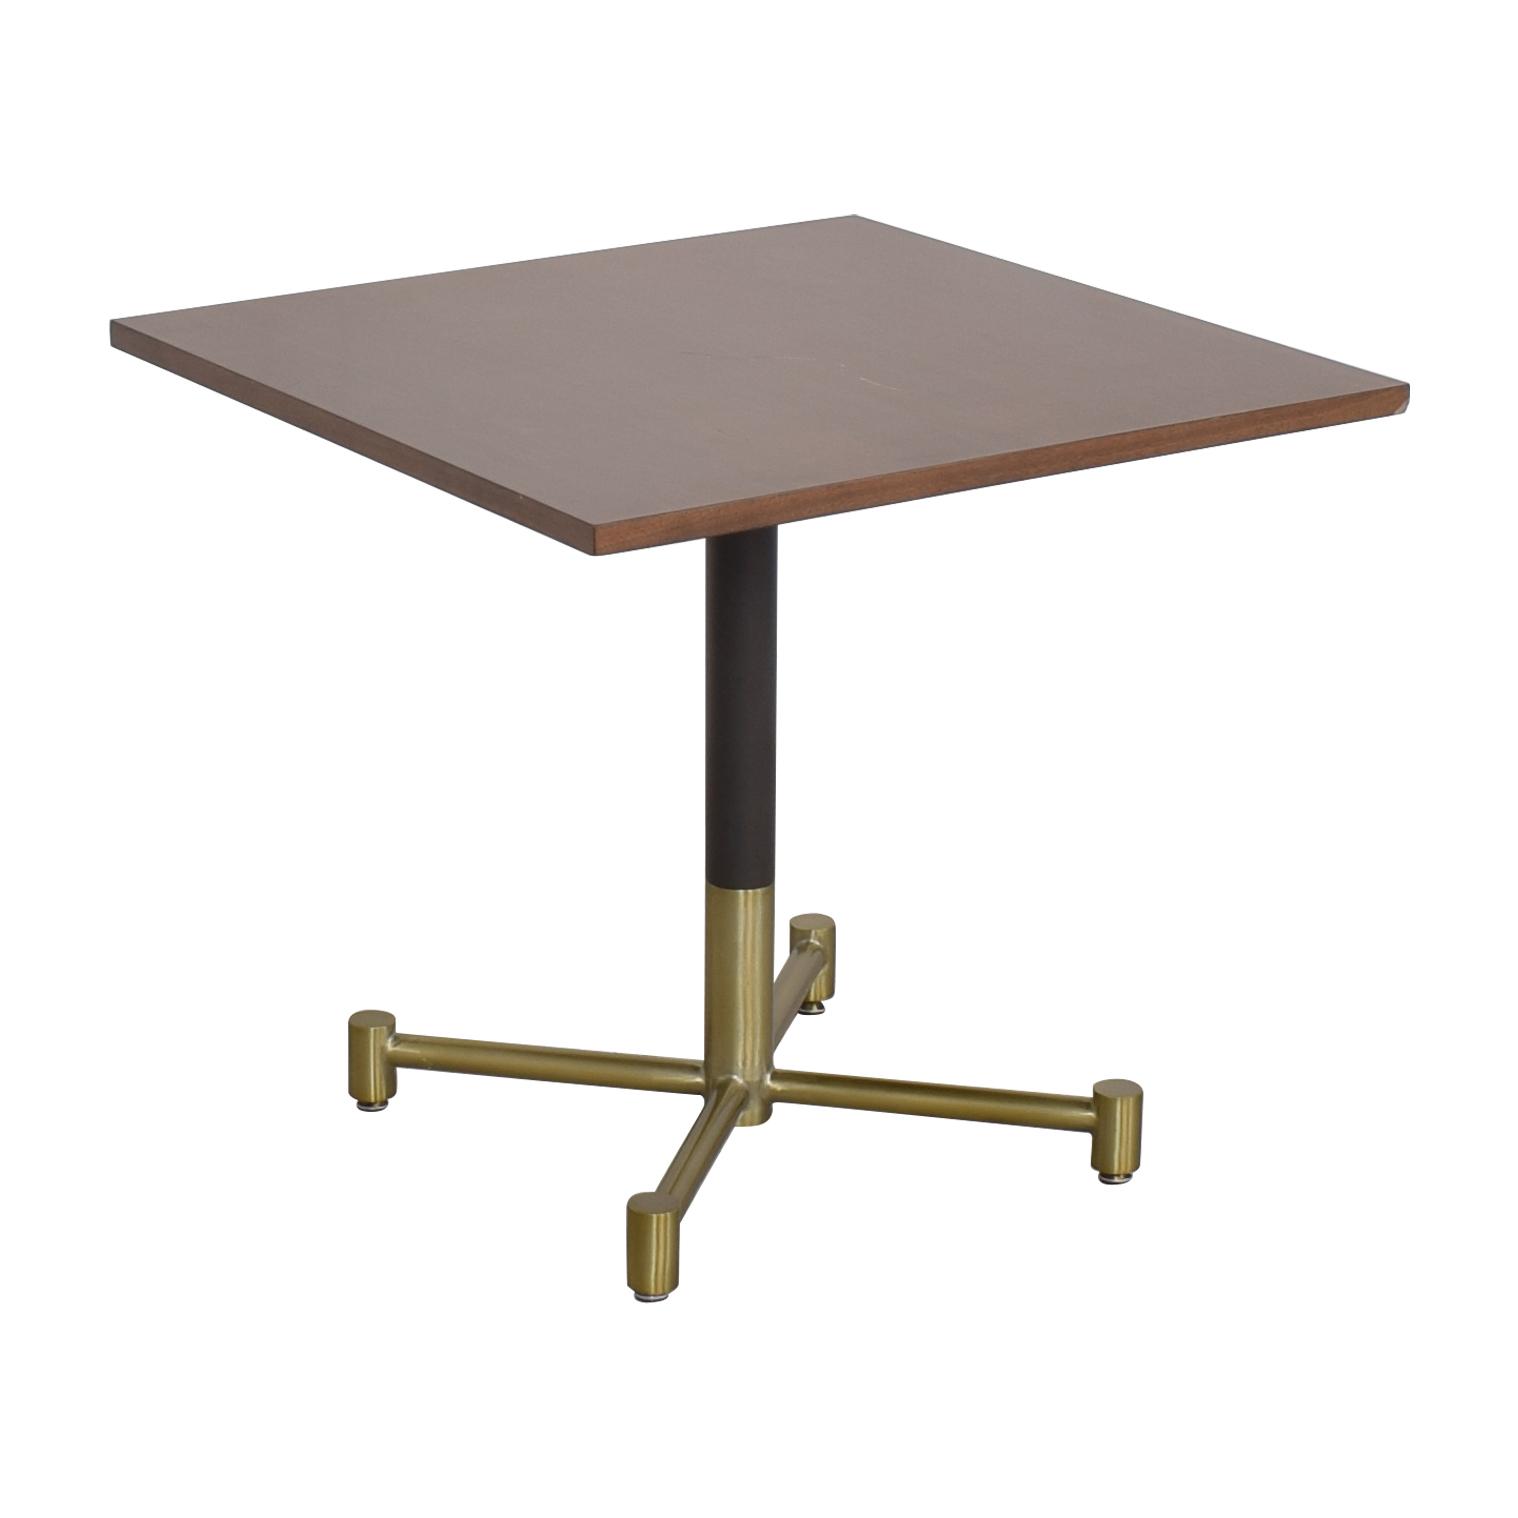 West Elm West Elm Square Bistro Table brown & gold